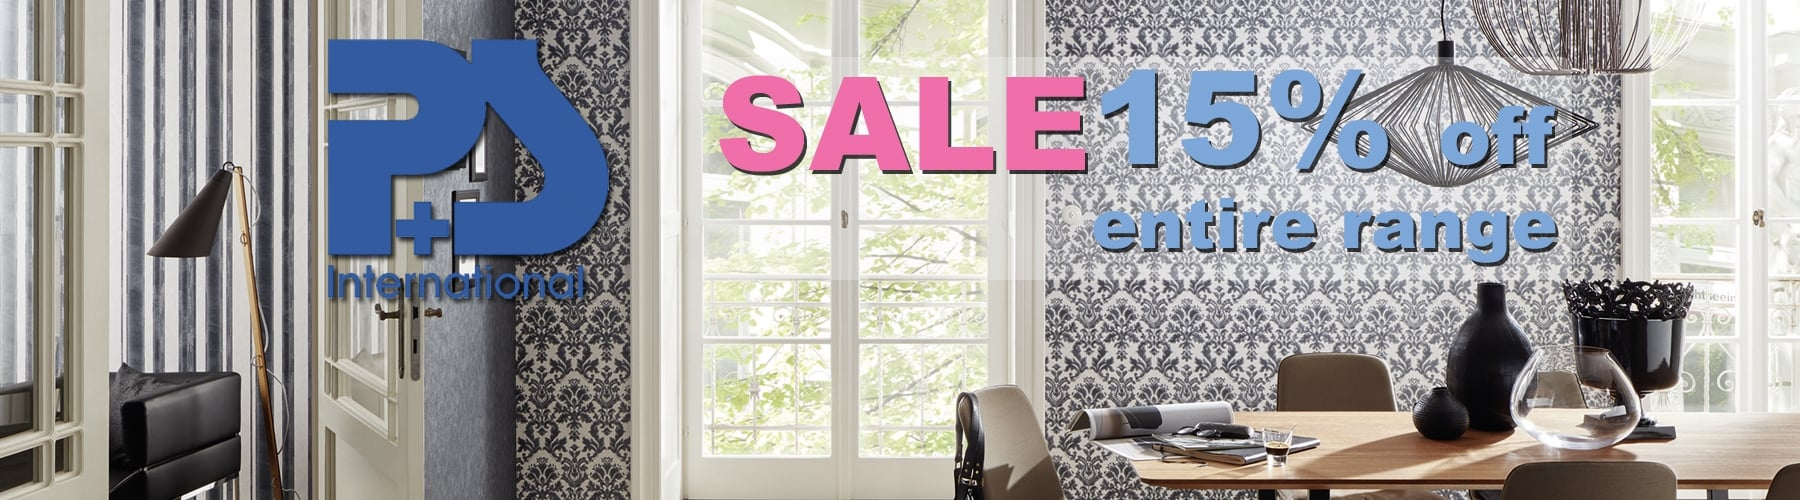 P&S 15% Sale